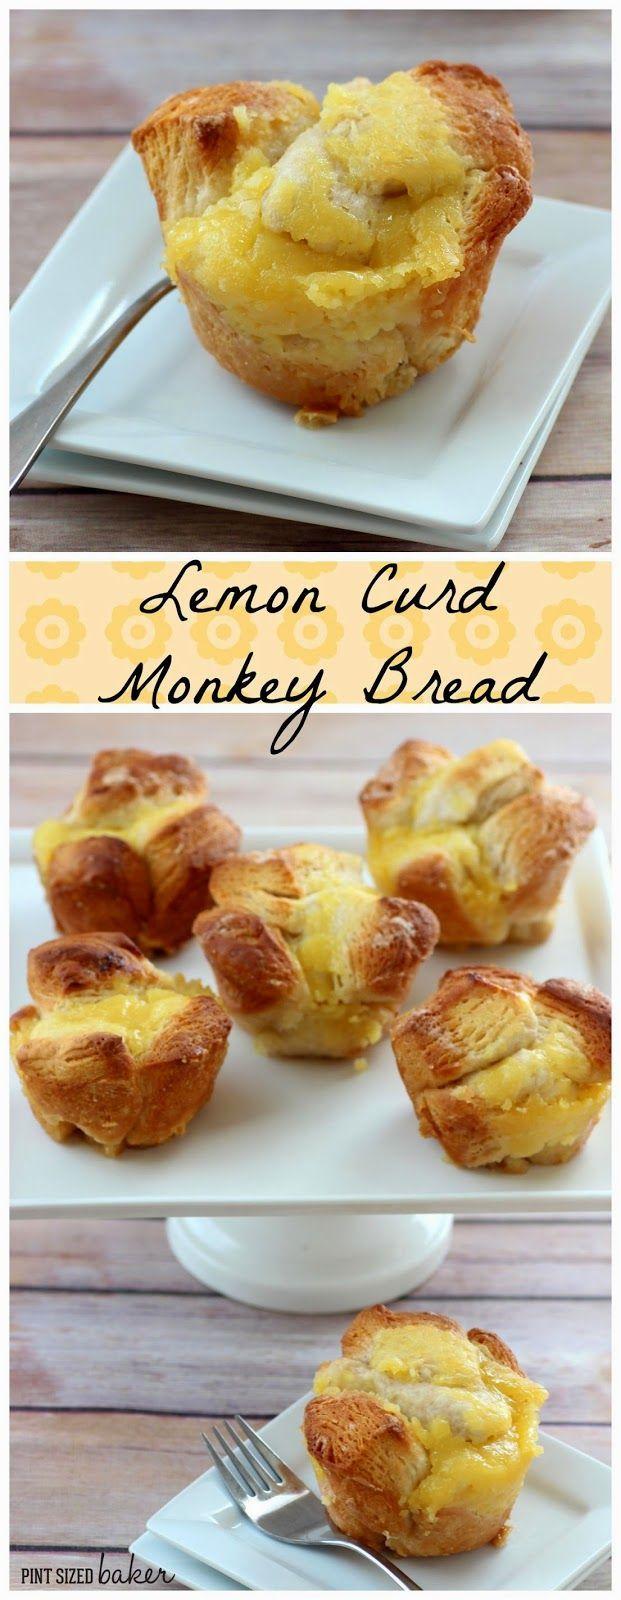 Pint Sized Baker: Individual Lemon Curd Monkey Bread